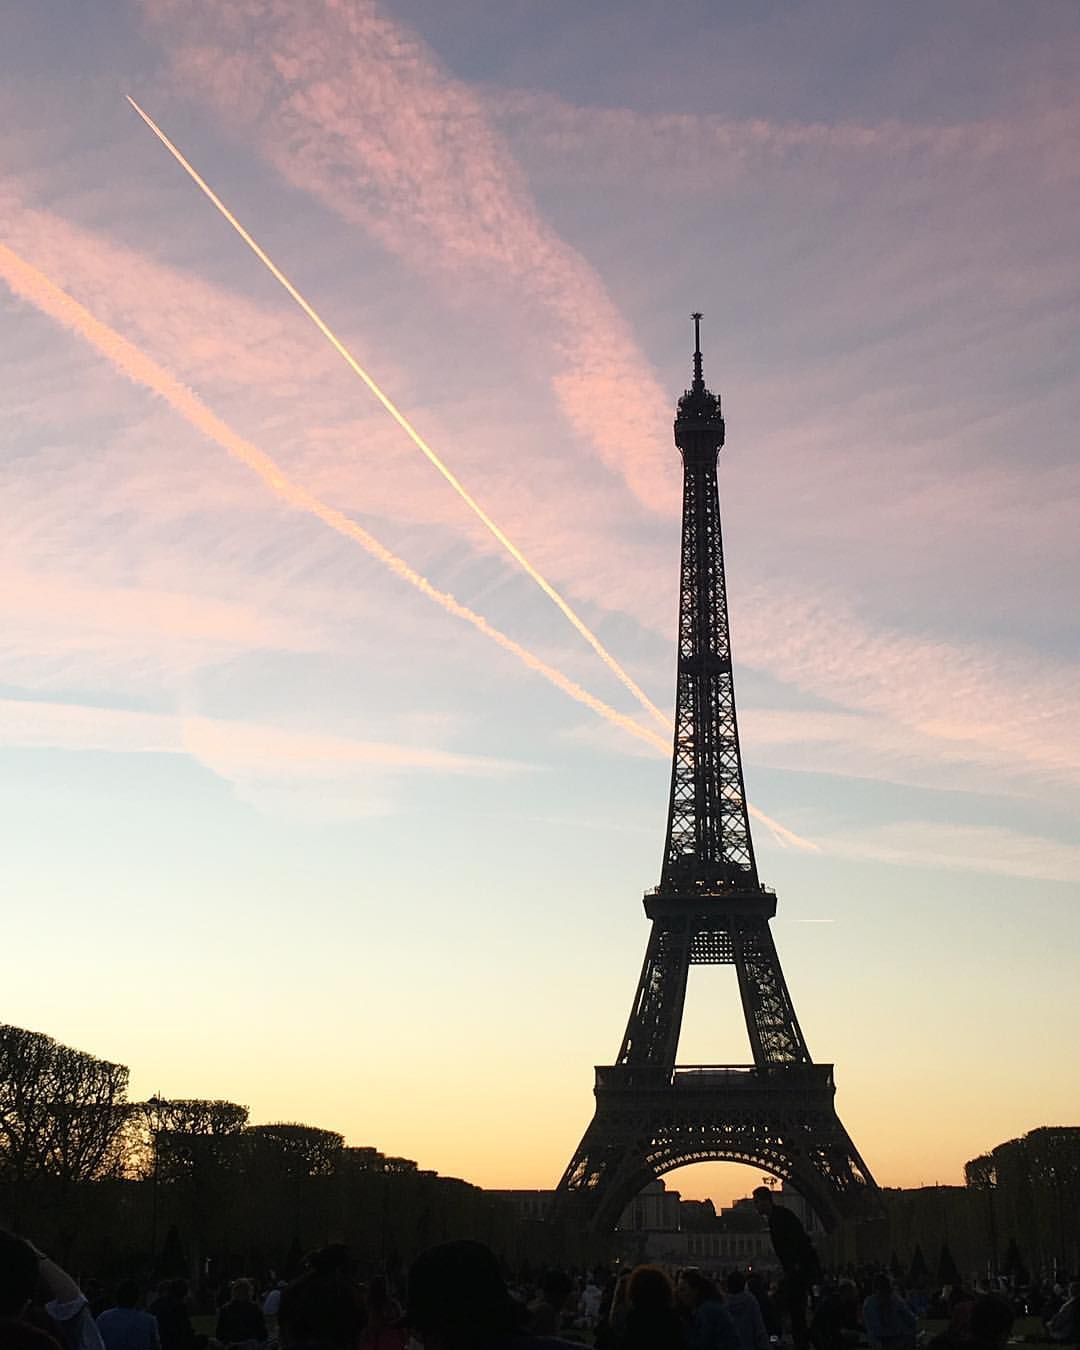 Paris Eiffel Tower At Sunset Ig Carmelanery In 2019